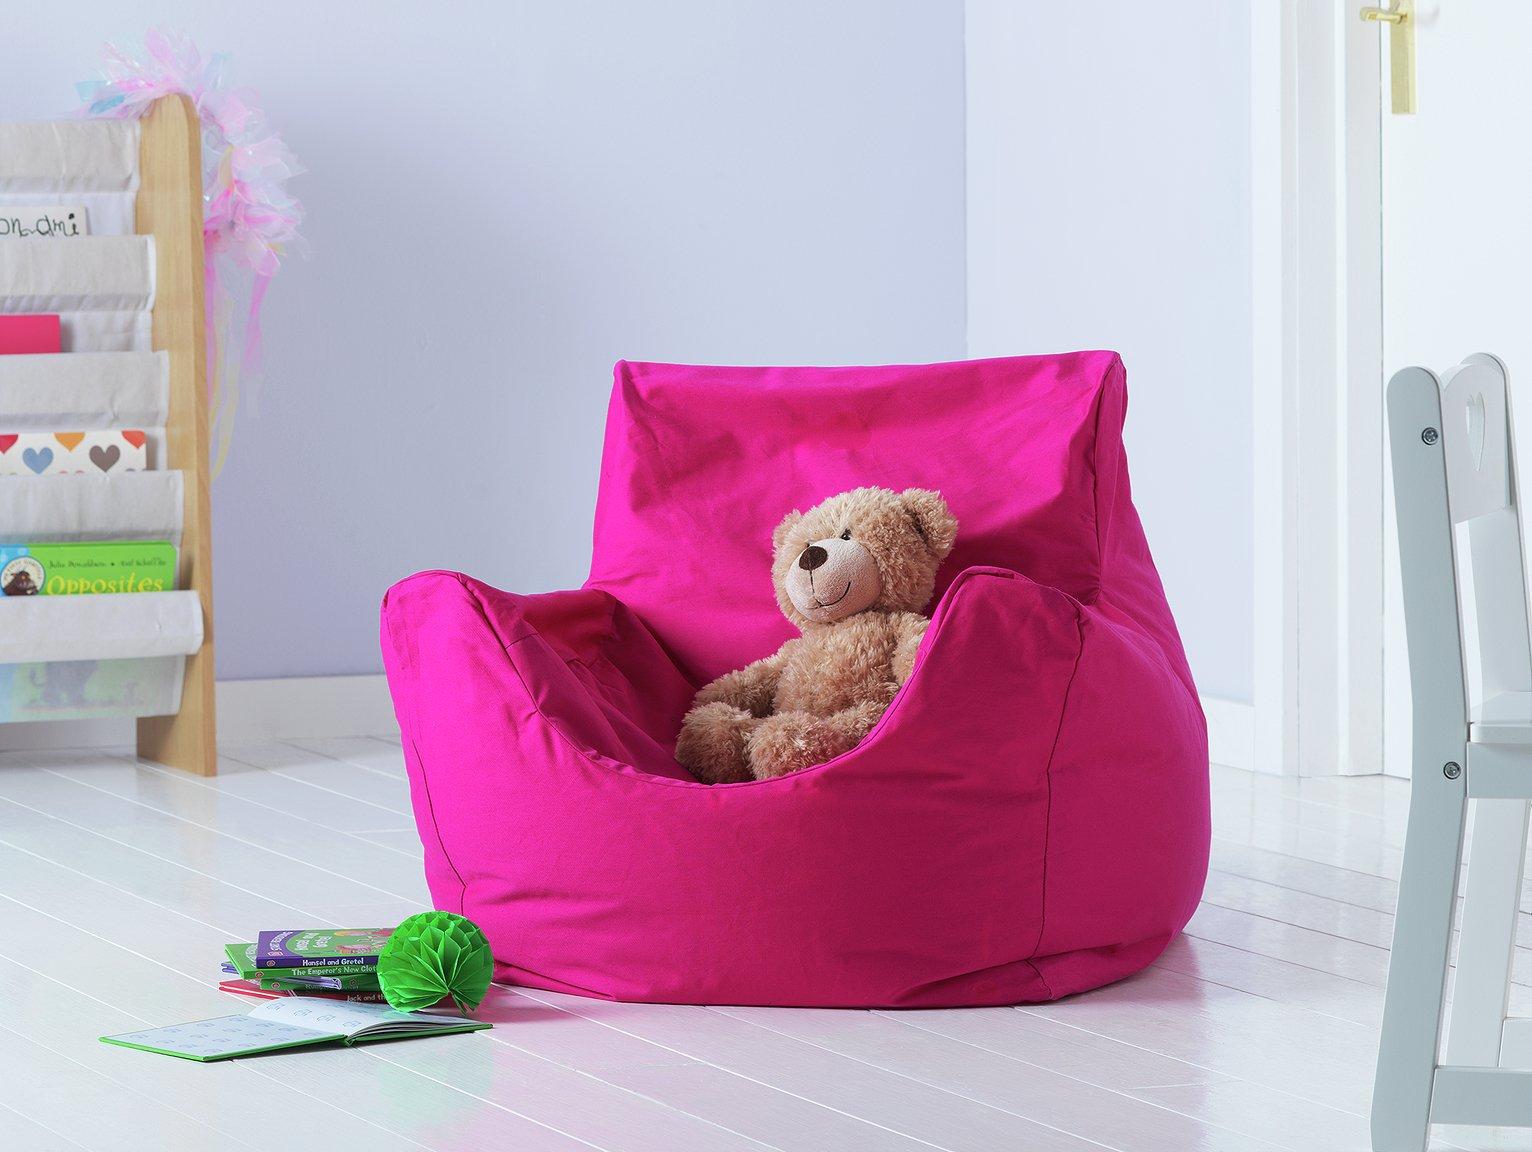 mini bean bag chair cover hire nuneaton beanbags chairs for kids adults argos home funzee